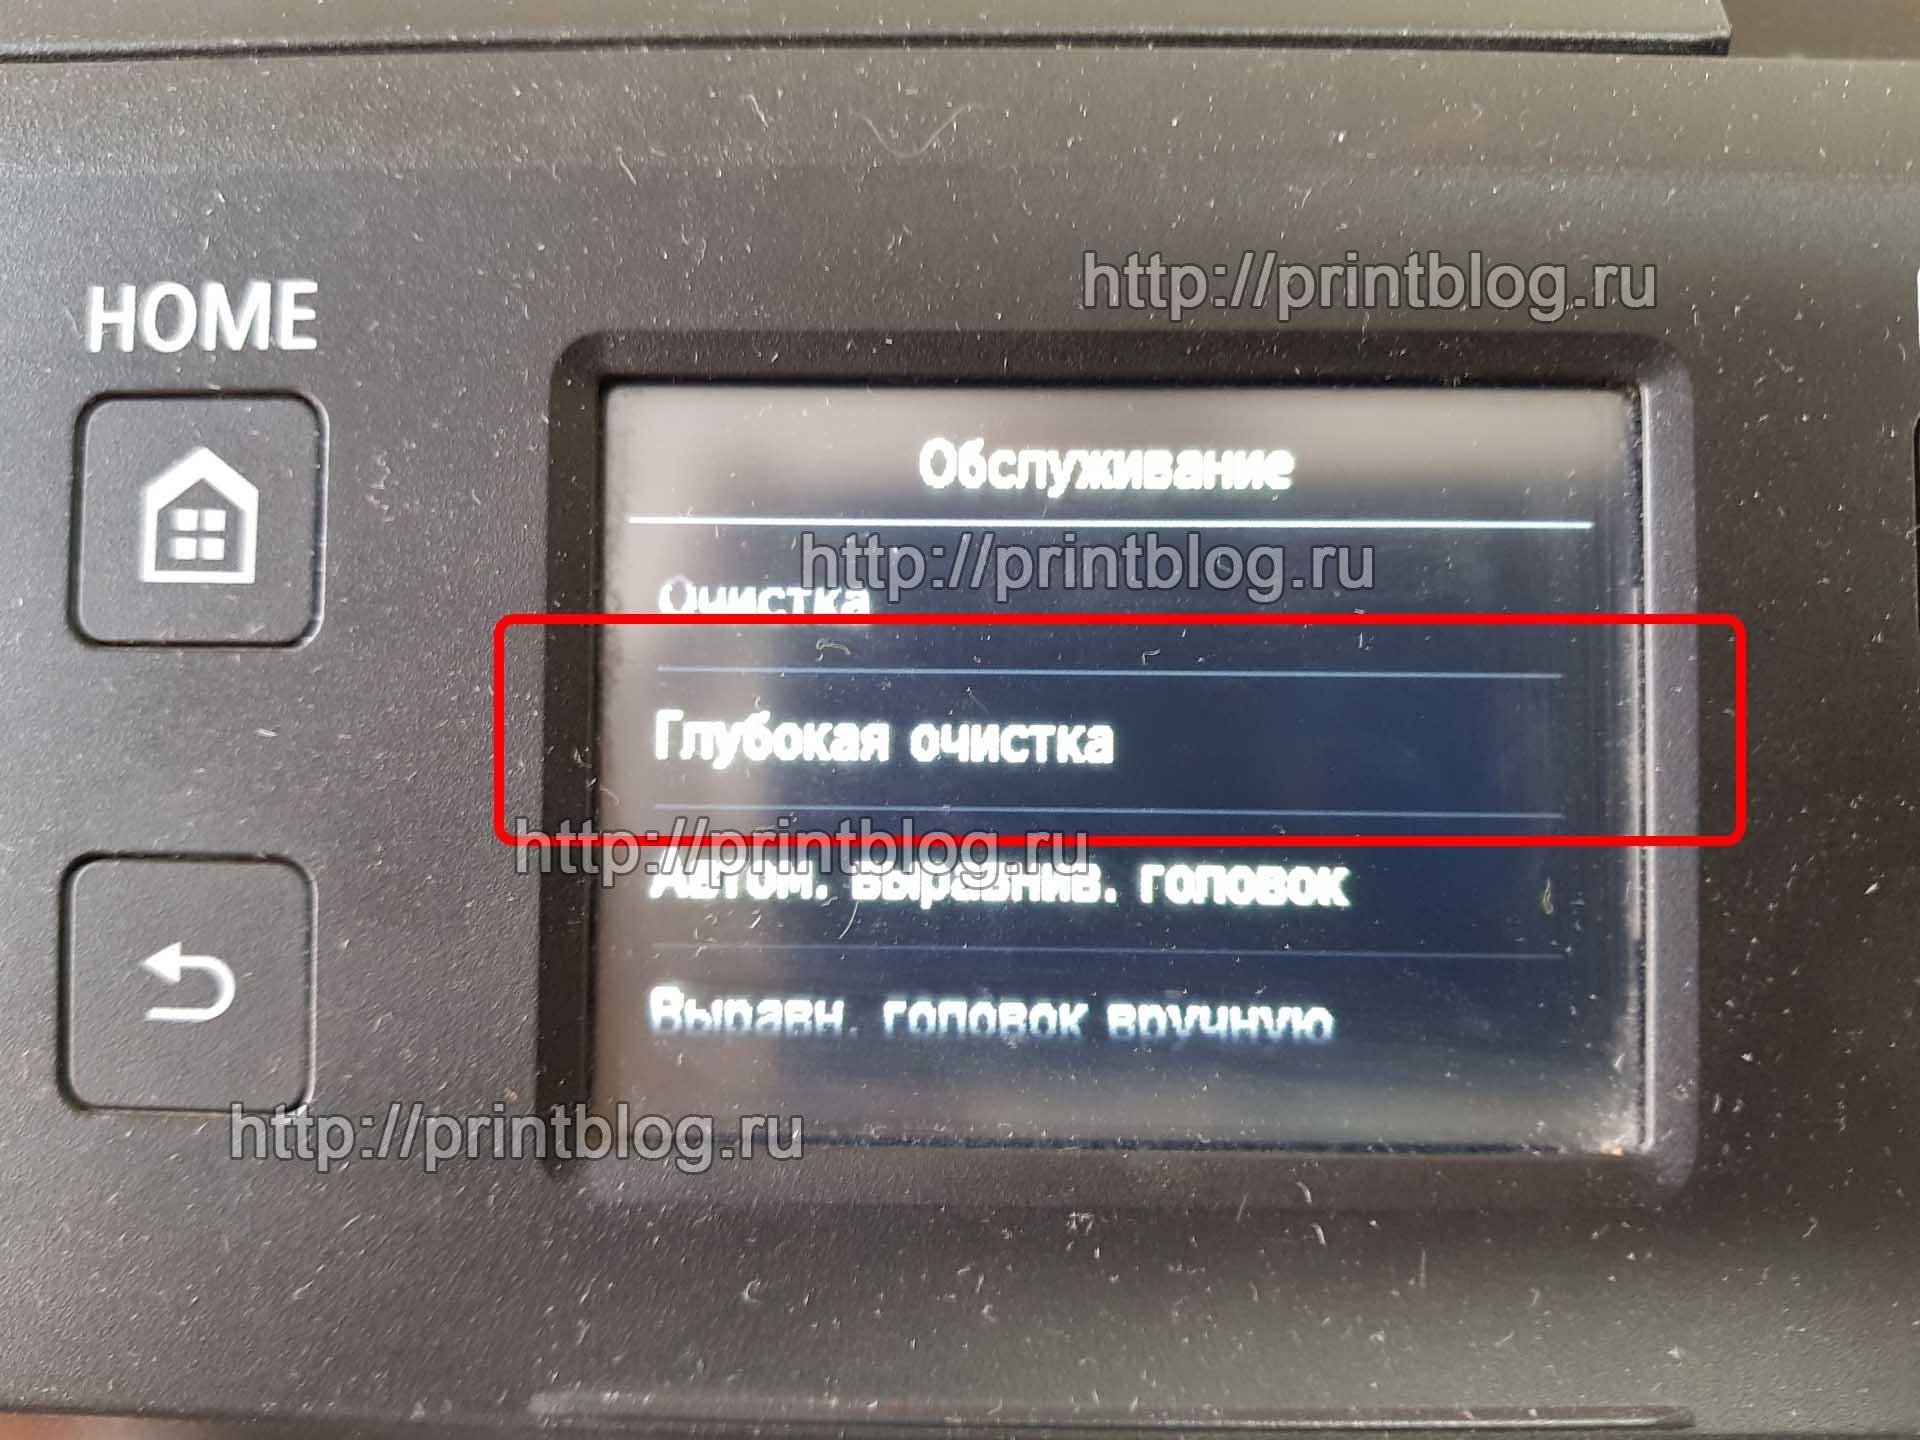 Canon MAXIFY MB2340 Код поддержки B504